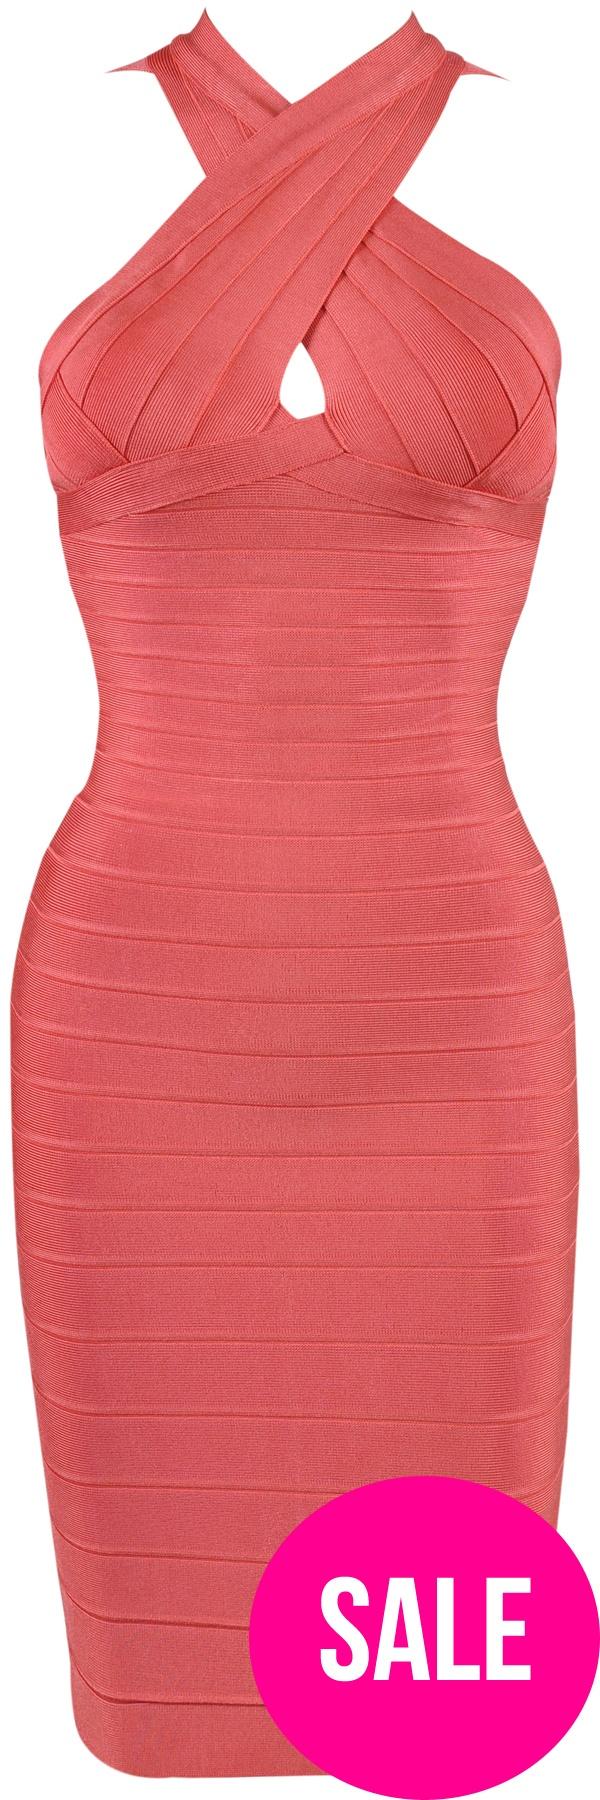 'Vixen' Coral Wrap Halter Bandage Bodycon Dress - SALE